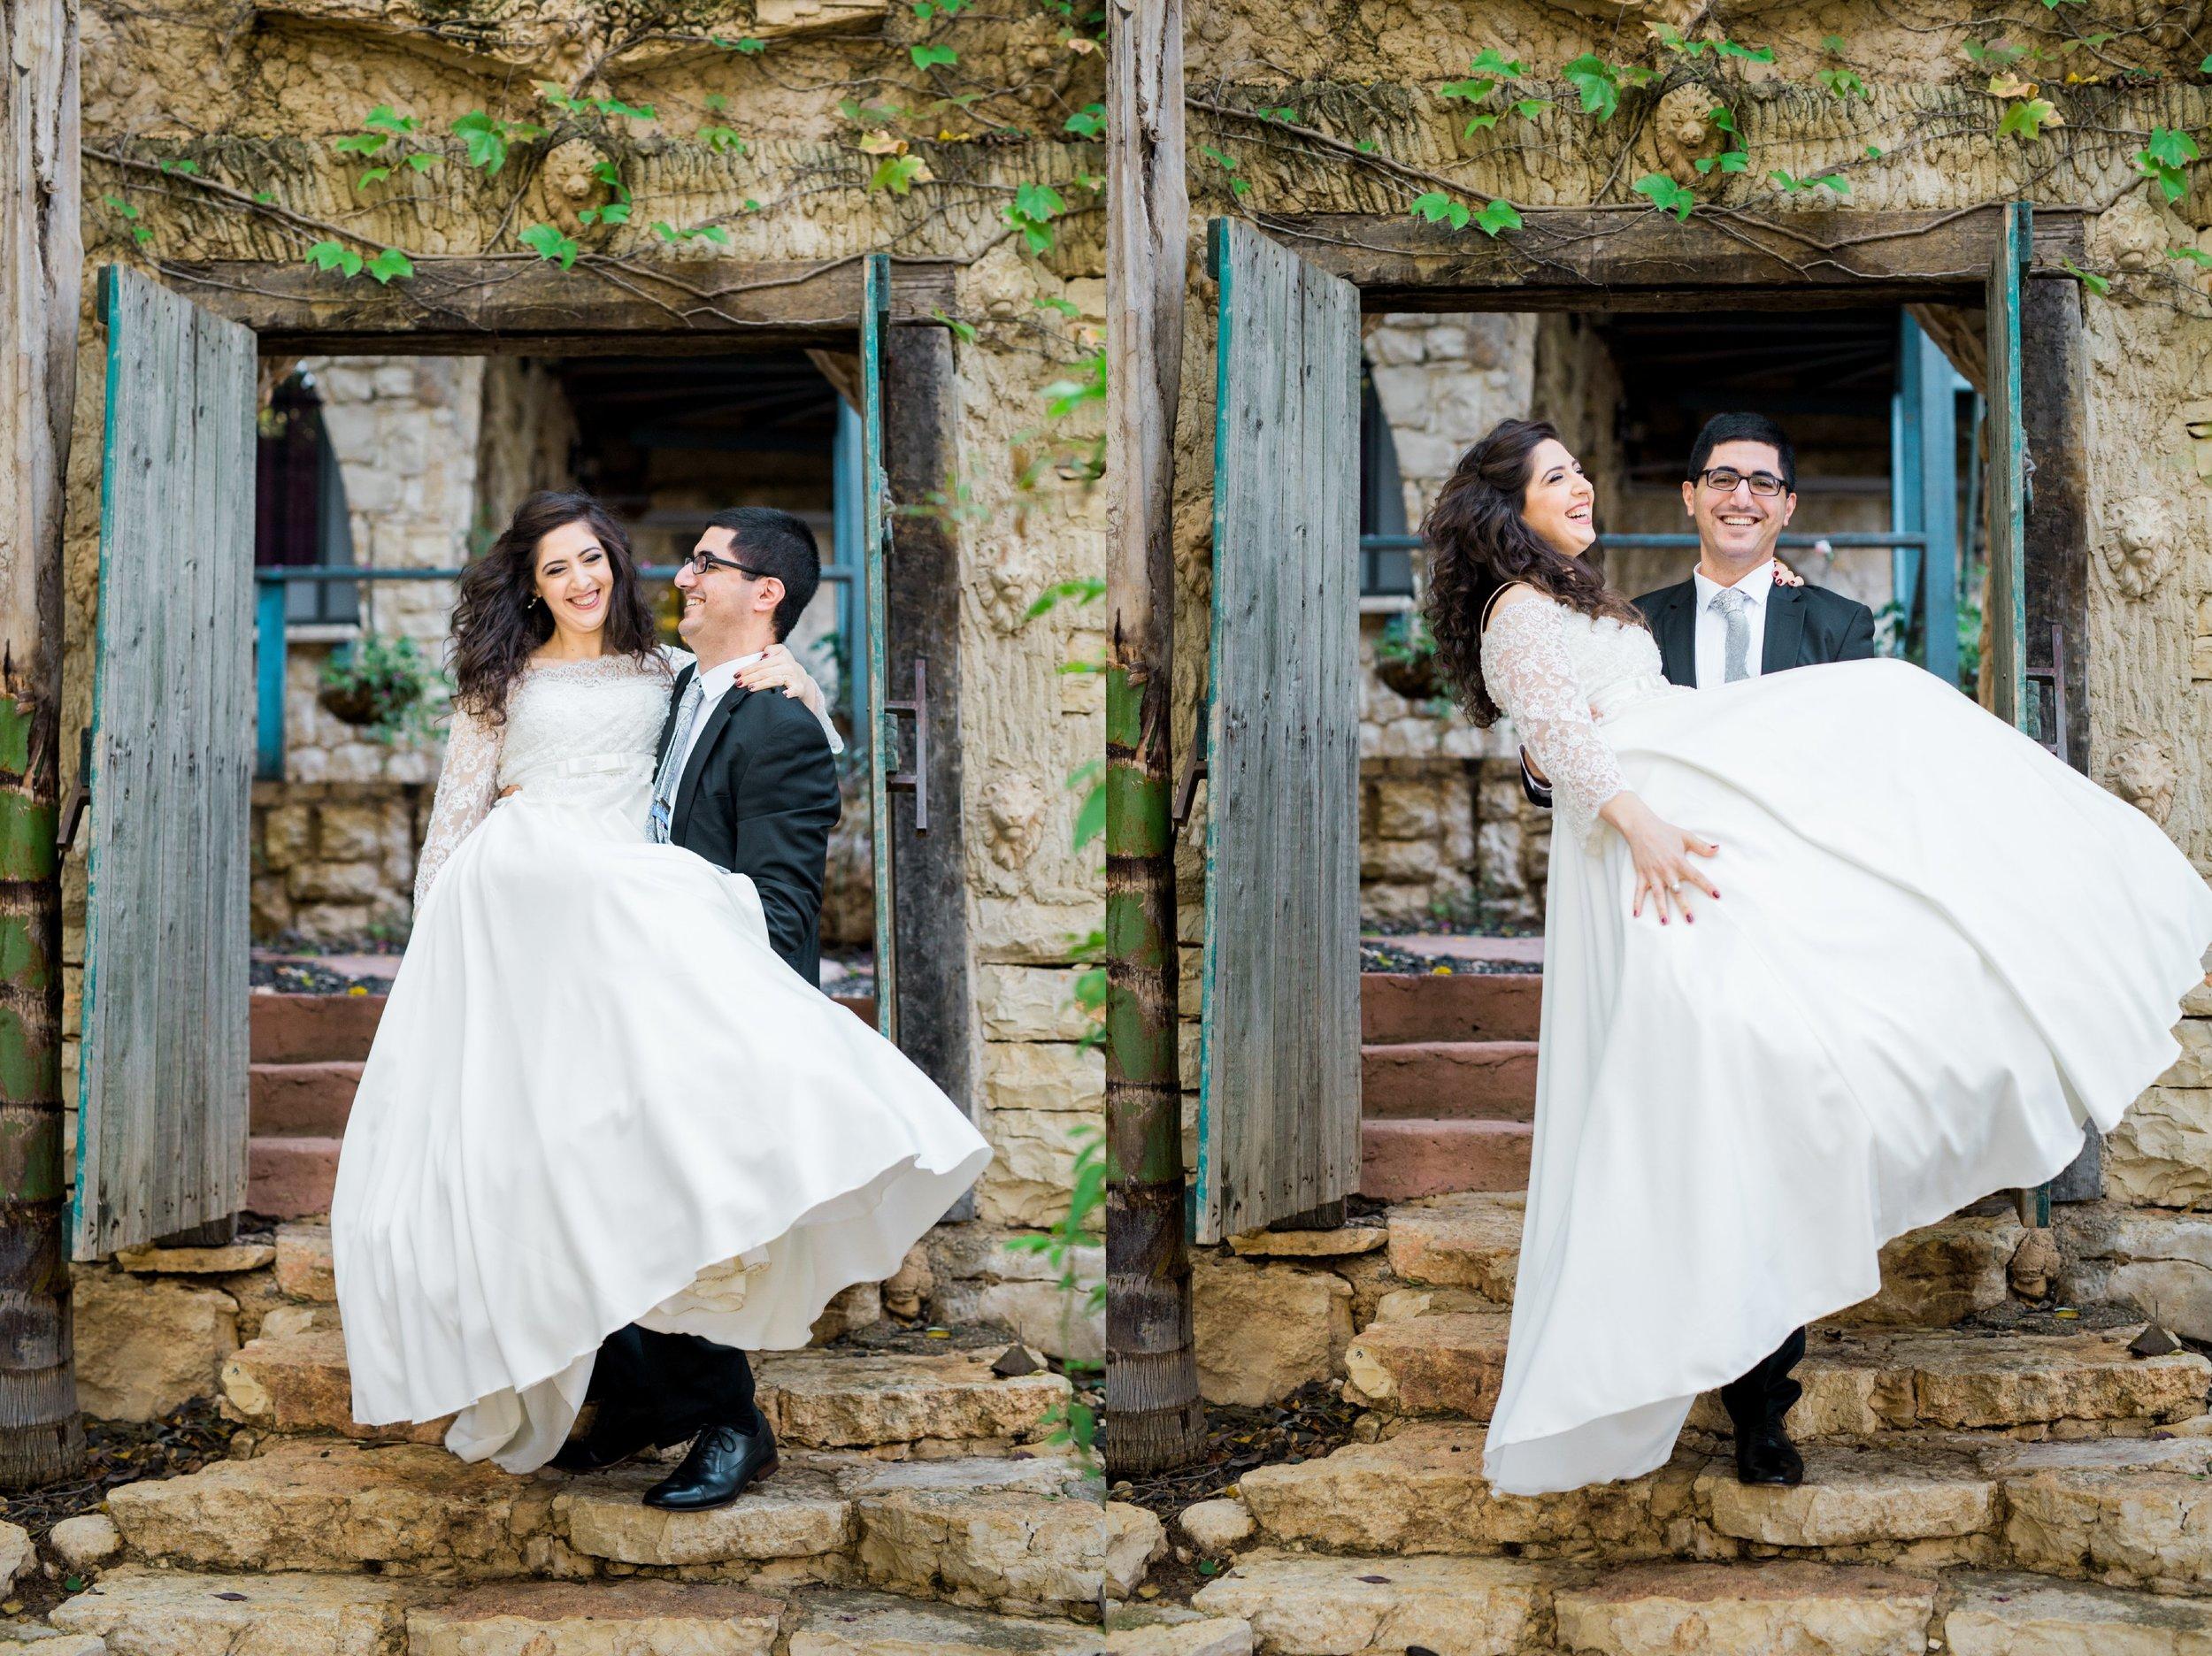 israel-garden-wedding-portraits-session-kate-giryes-photography--12_WEB.jpg